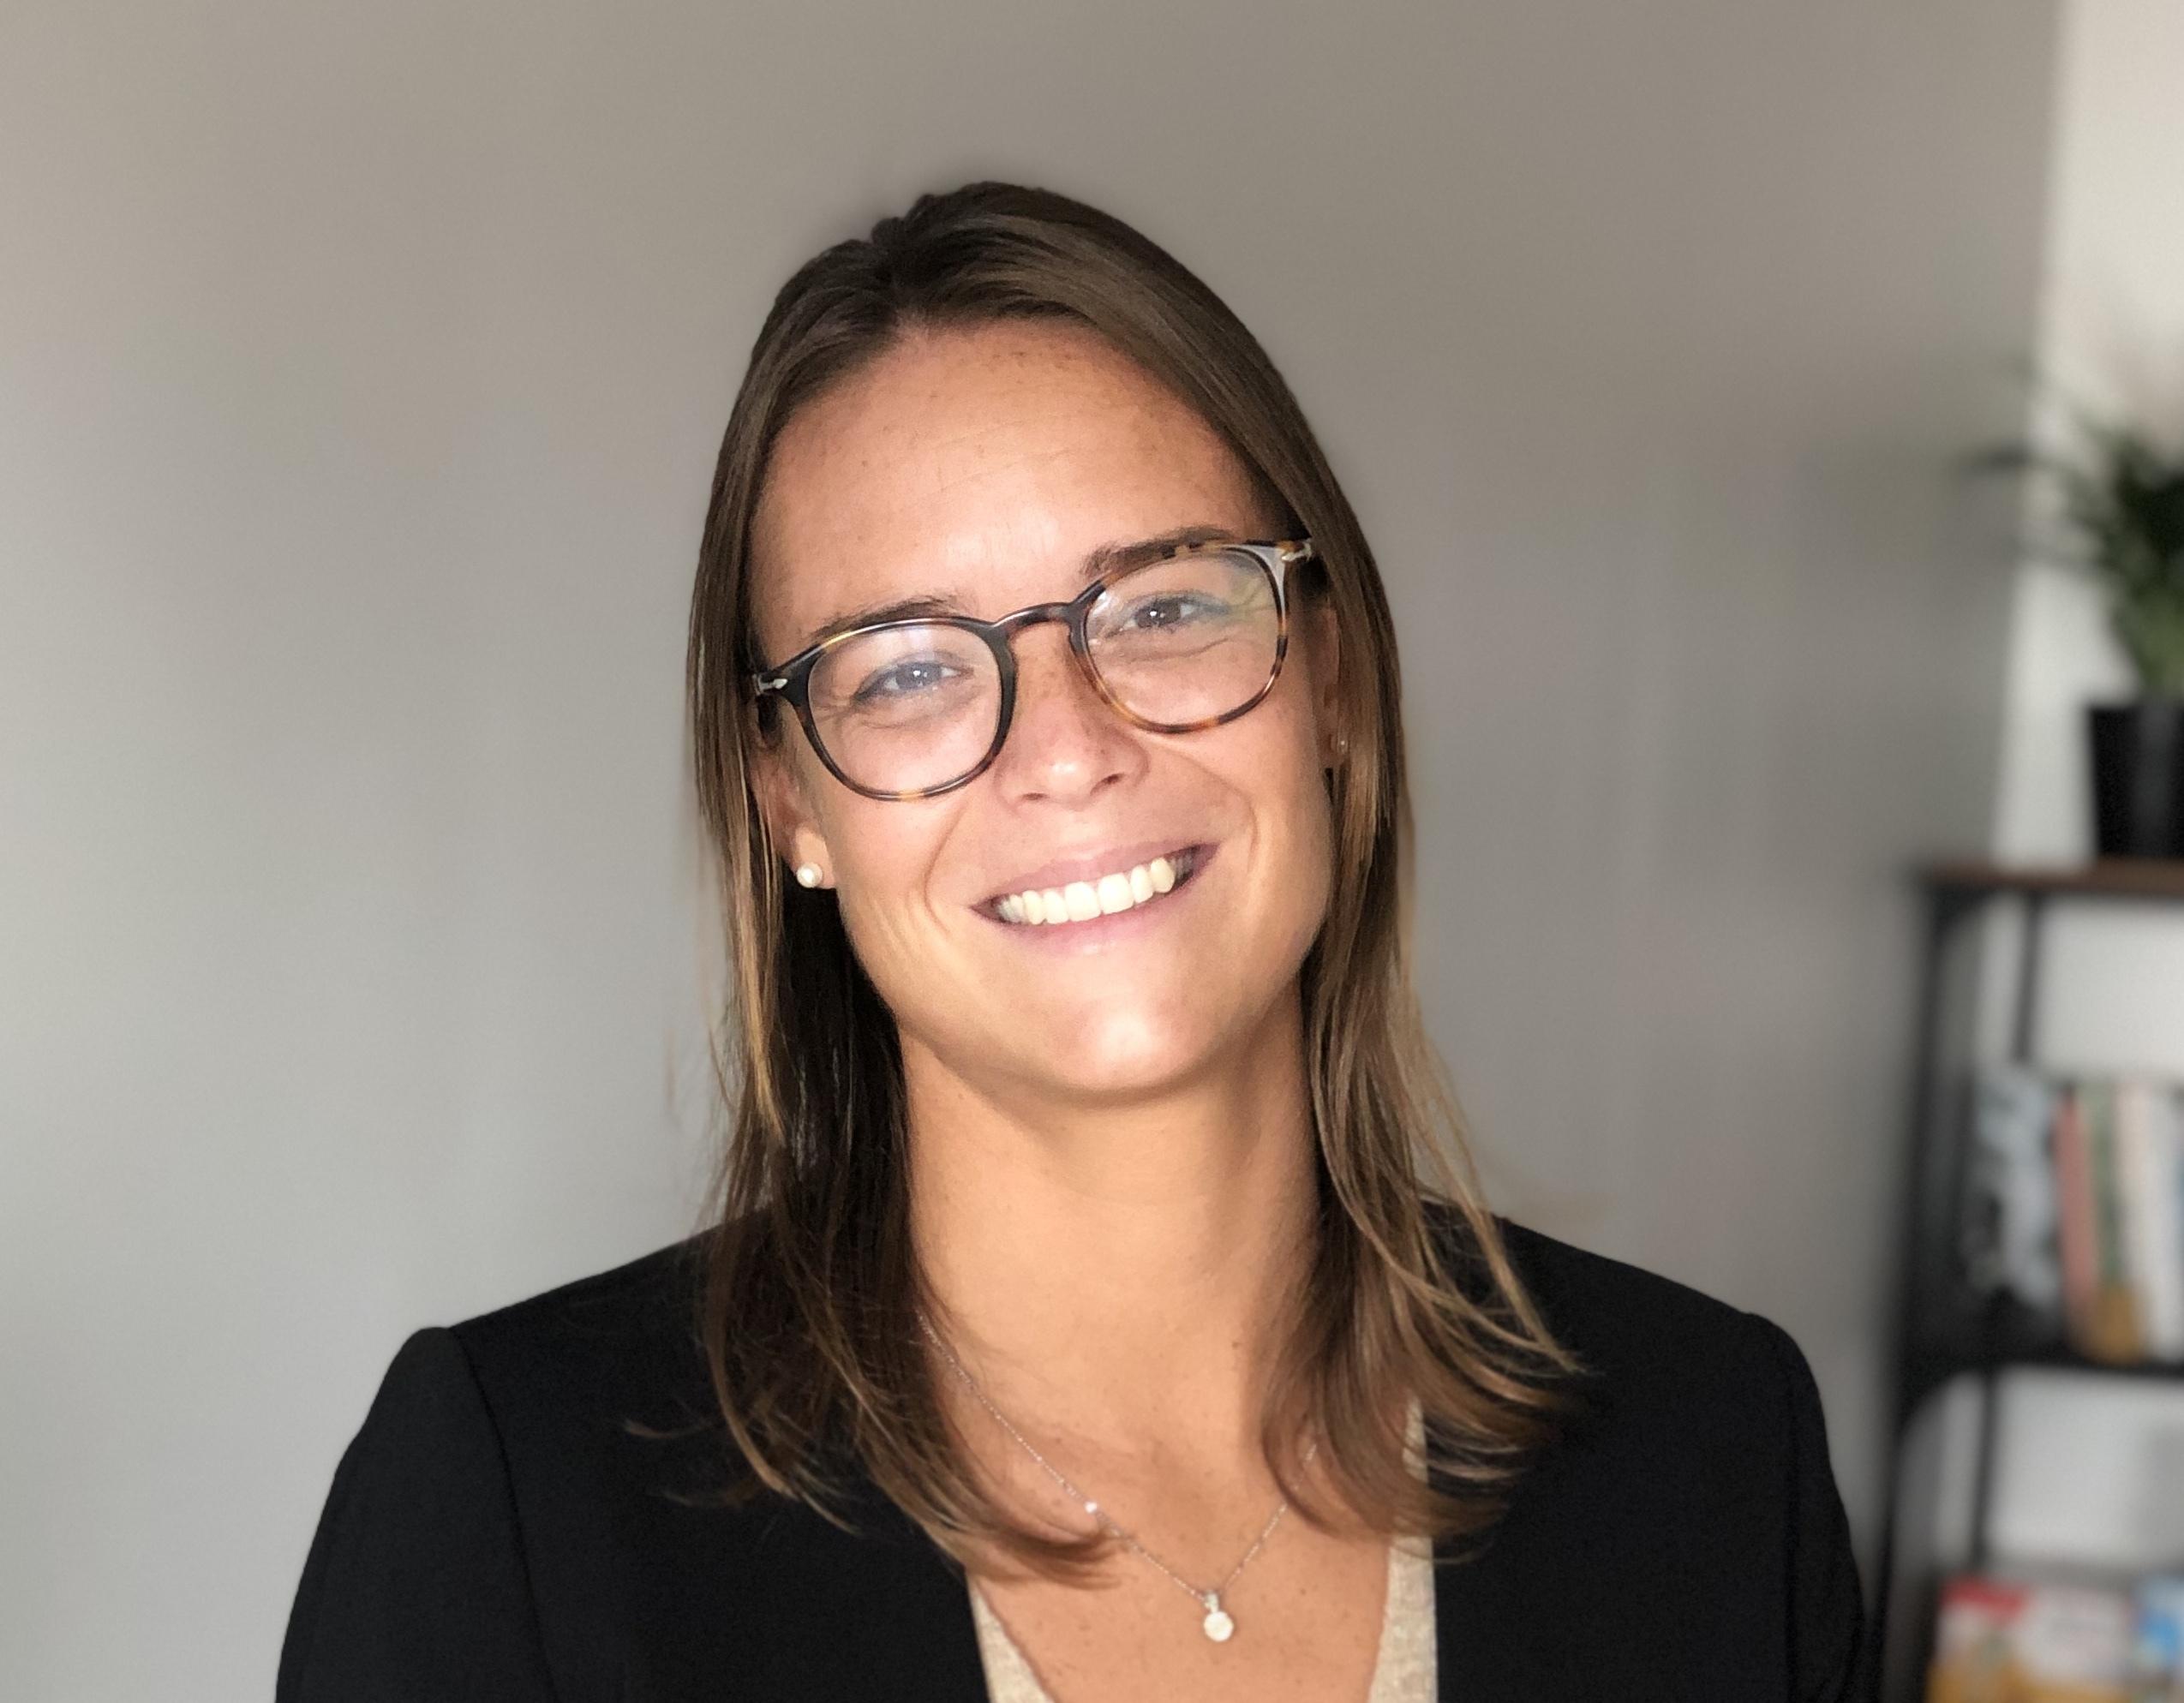 Gesichter Katja Hunstock